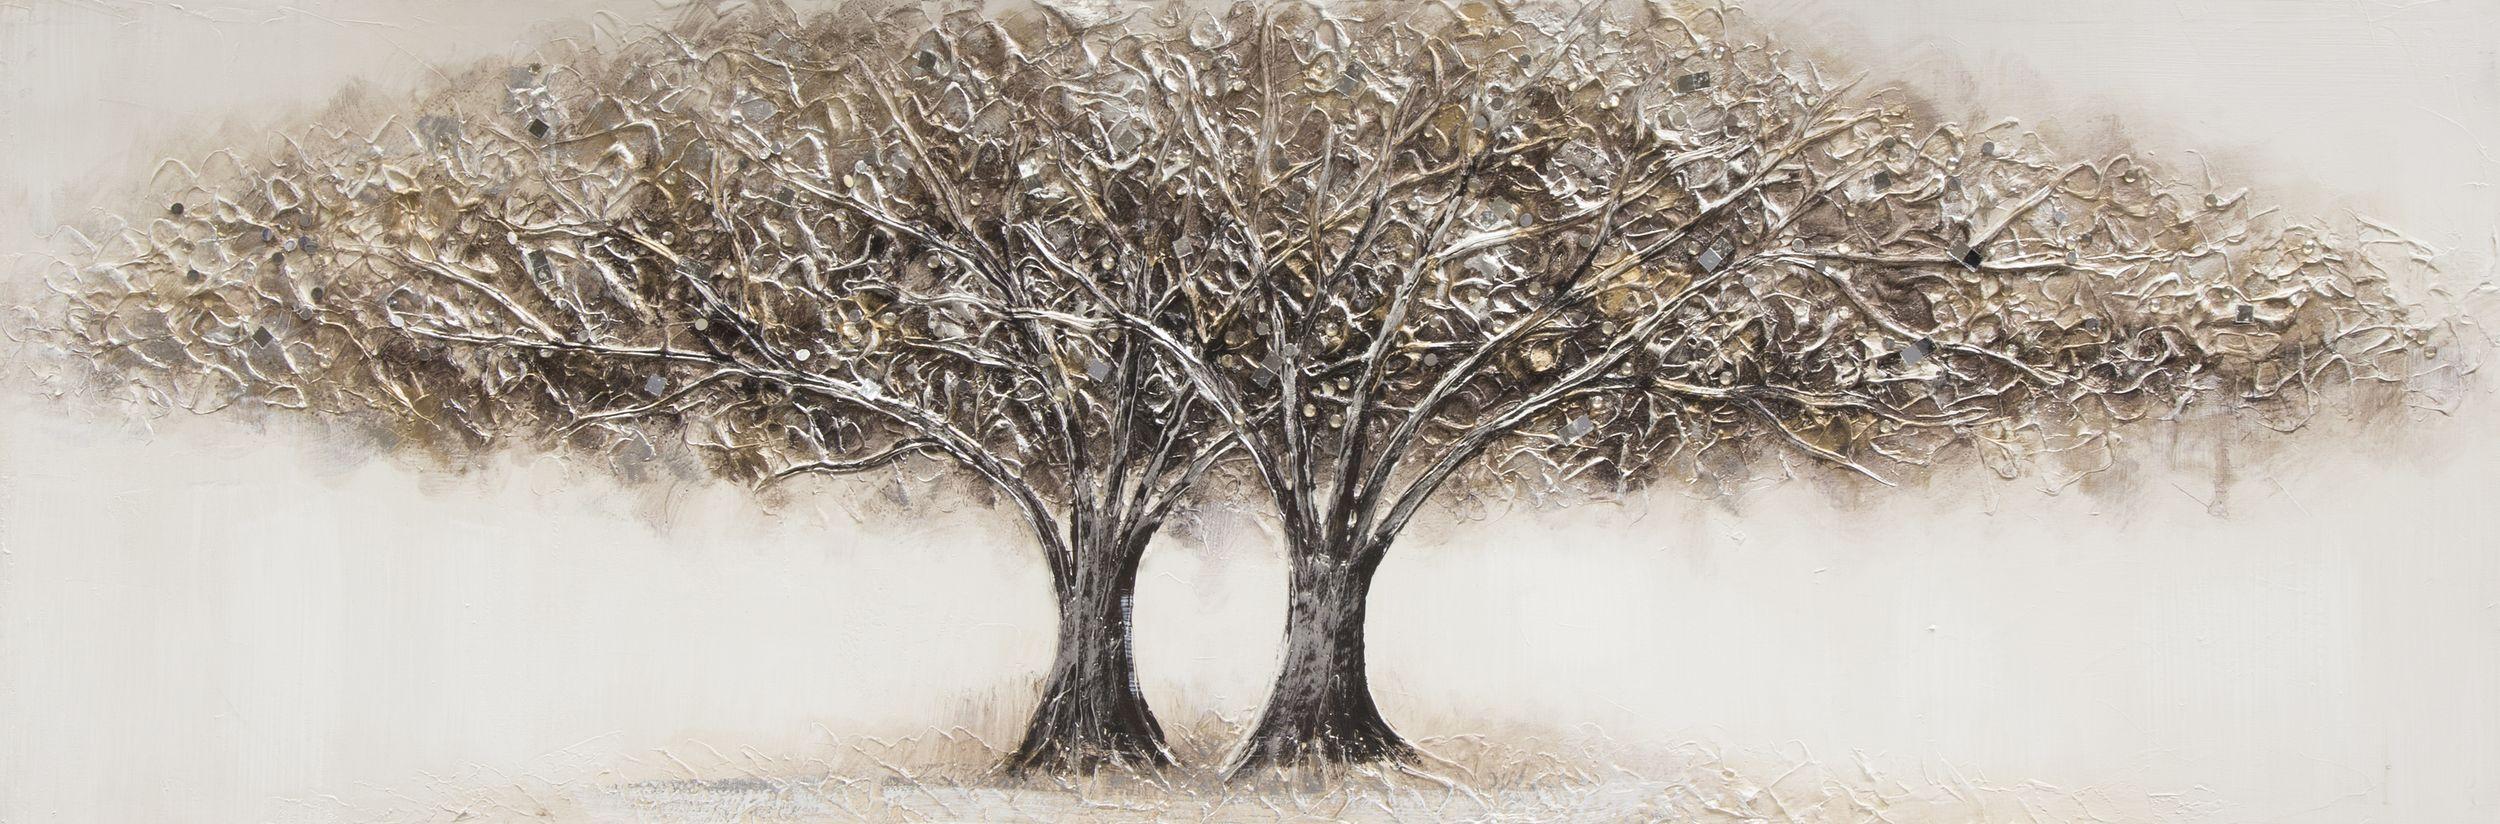 Keilrahmenbild 50x150cm ORIGINAL SORDAN, TREE